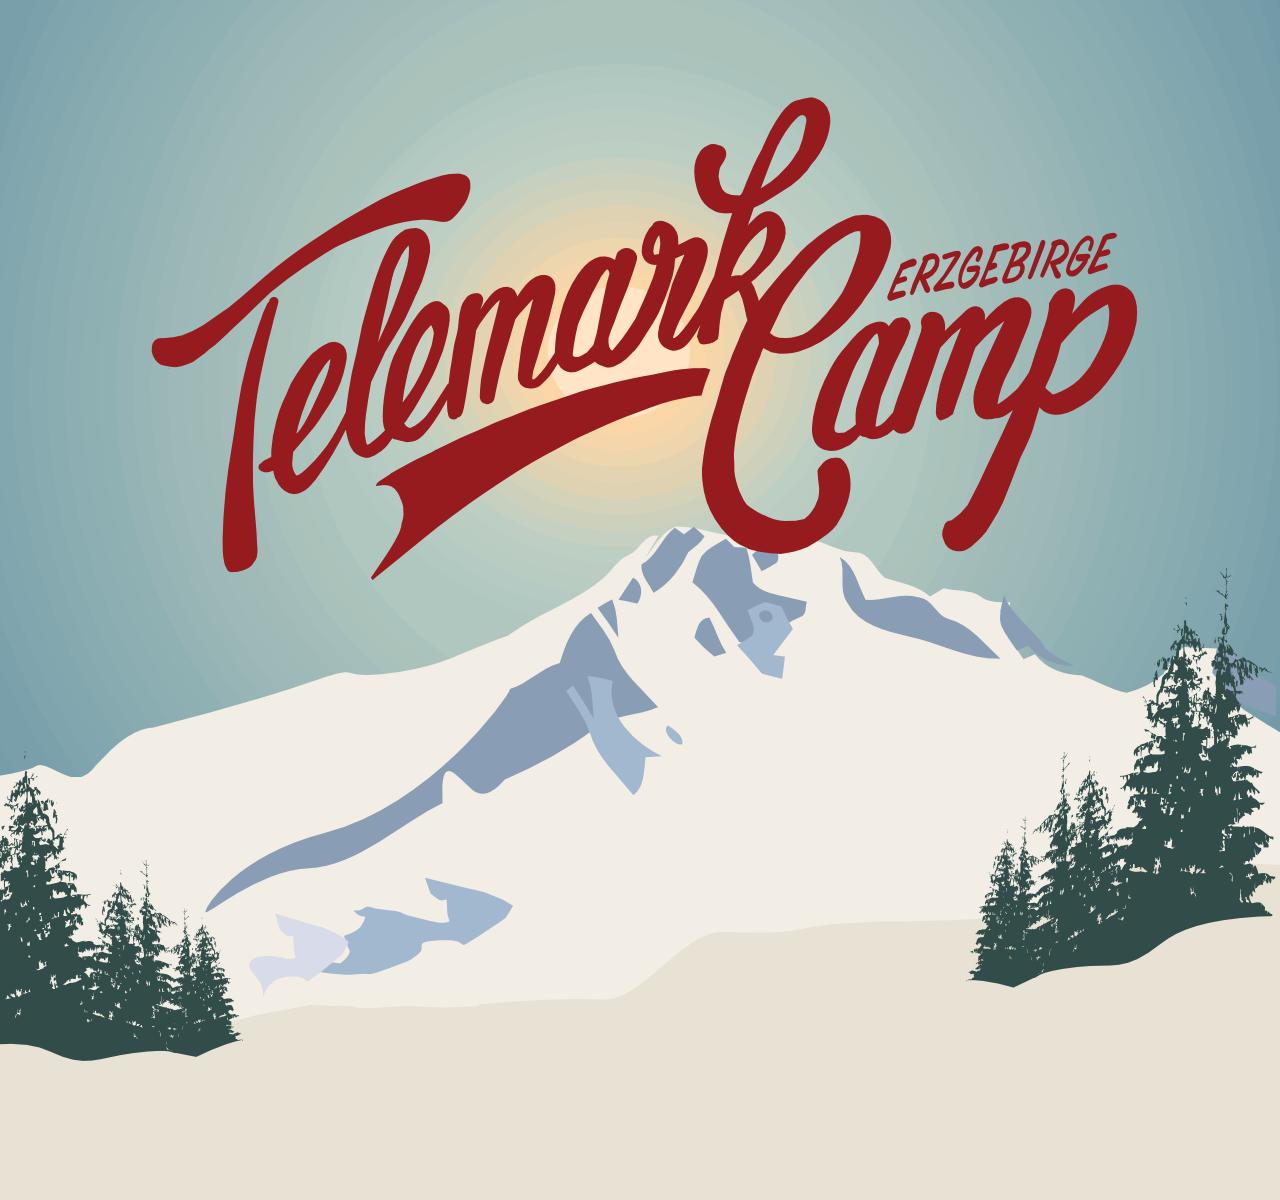 TELEMARKCAMP 2019